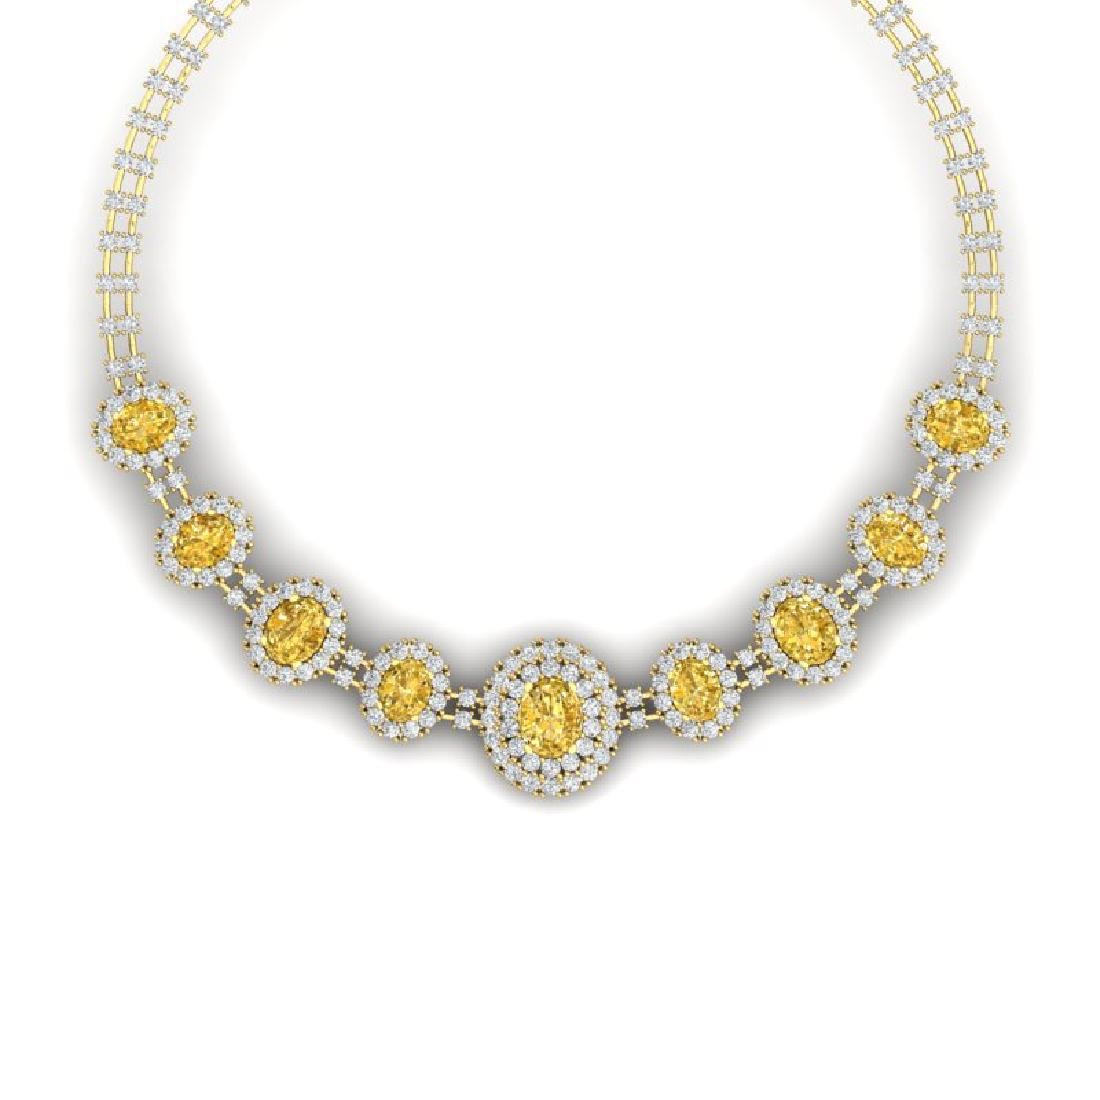 43.20 CTW Royalty Canary Citrine & VS Diamond Necklace